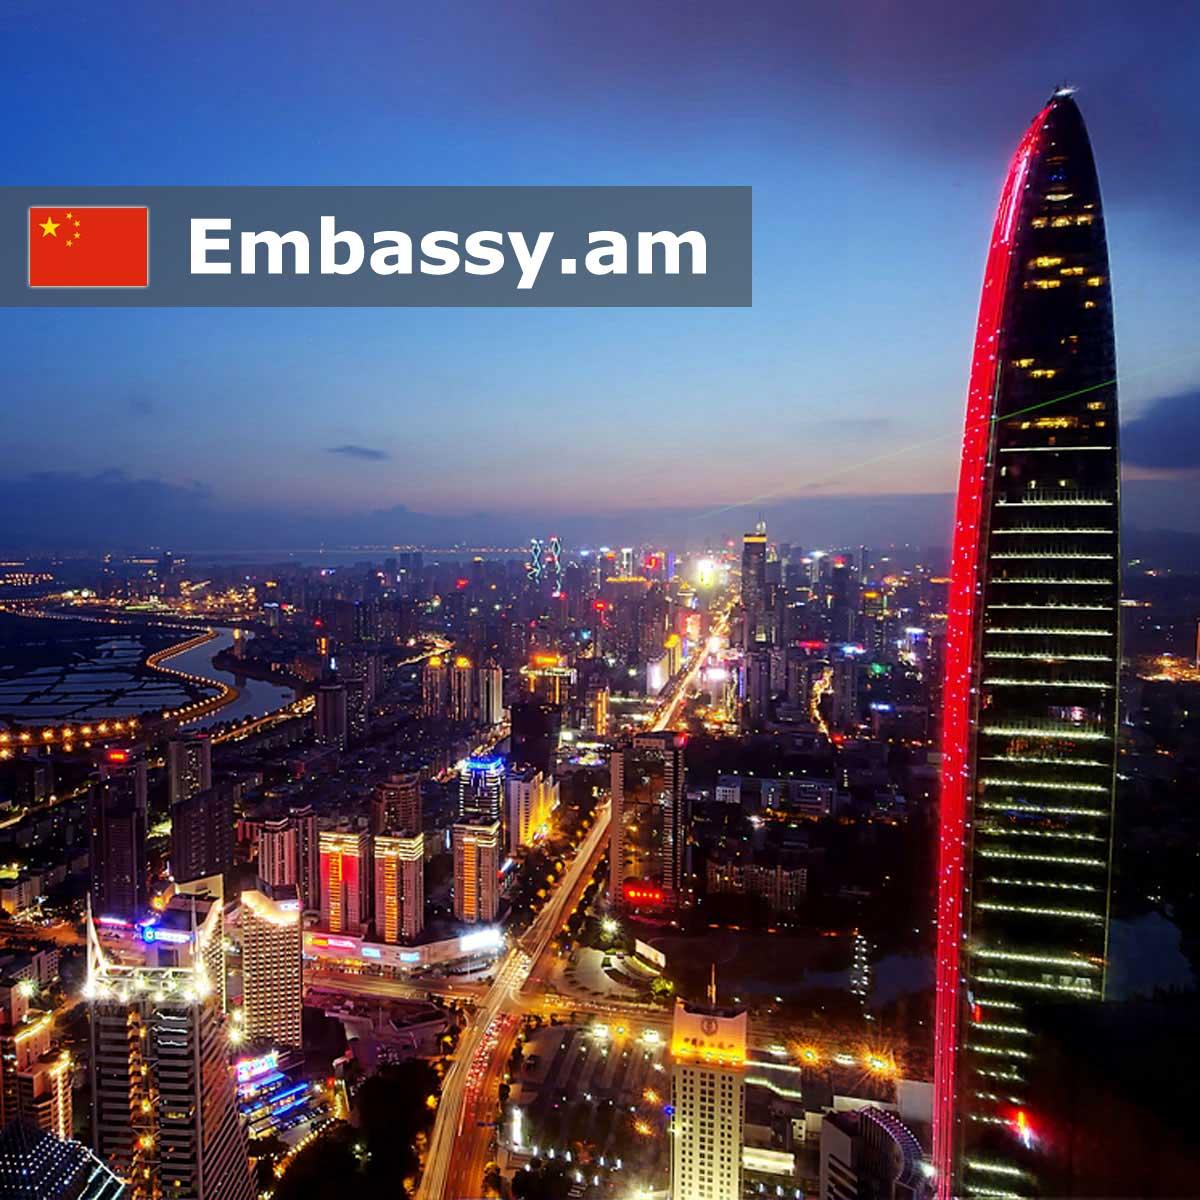 Shenzhen - Hotels in China - Embassy.am